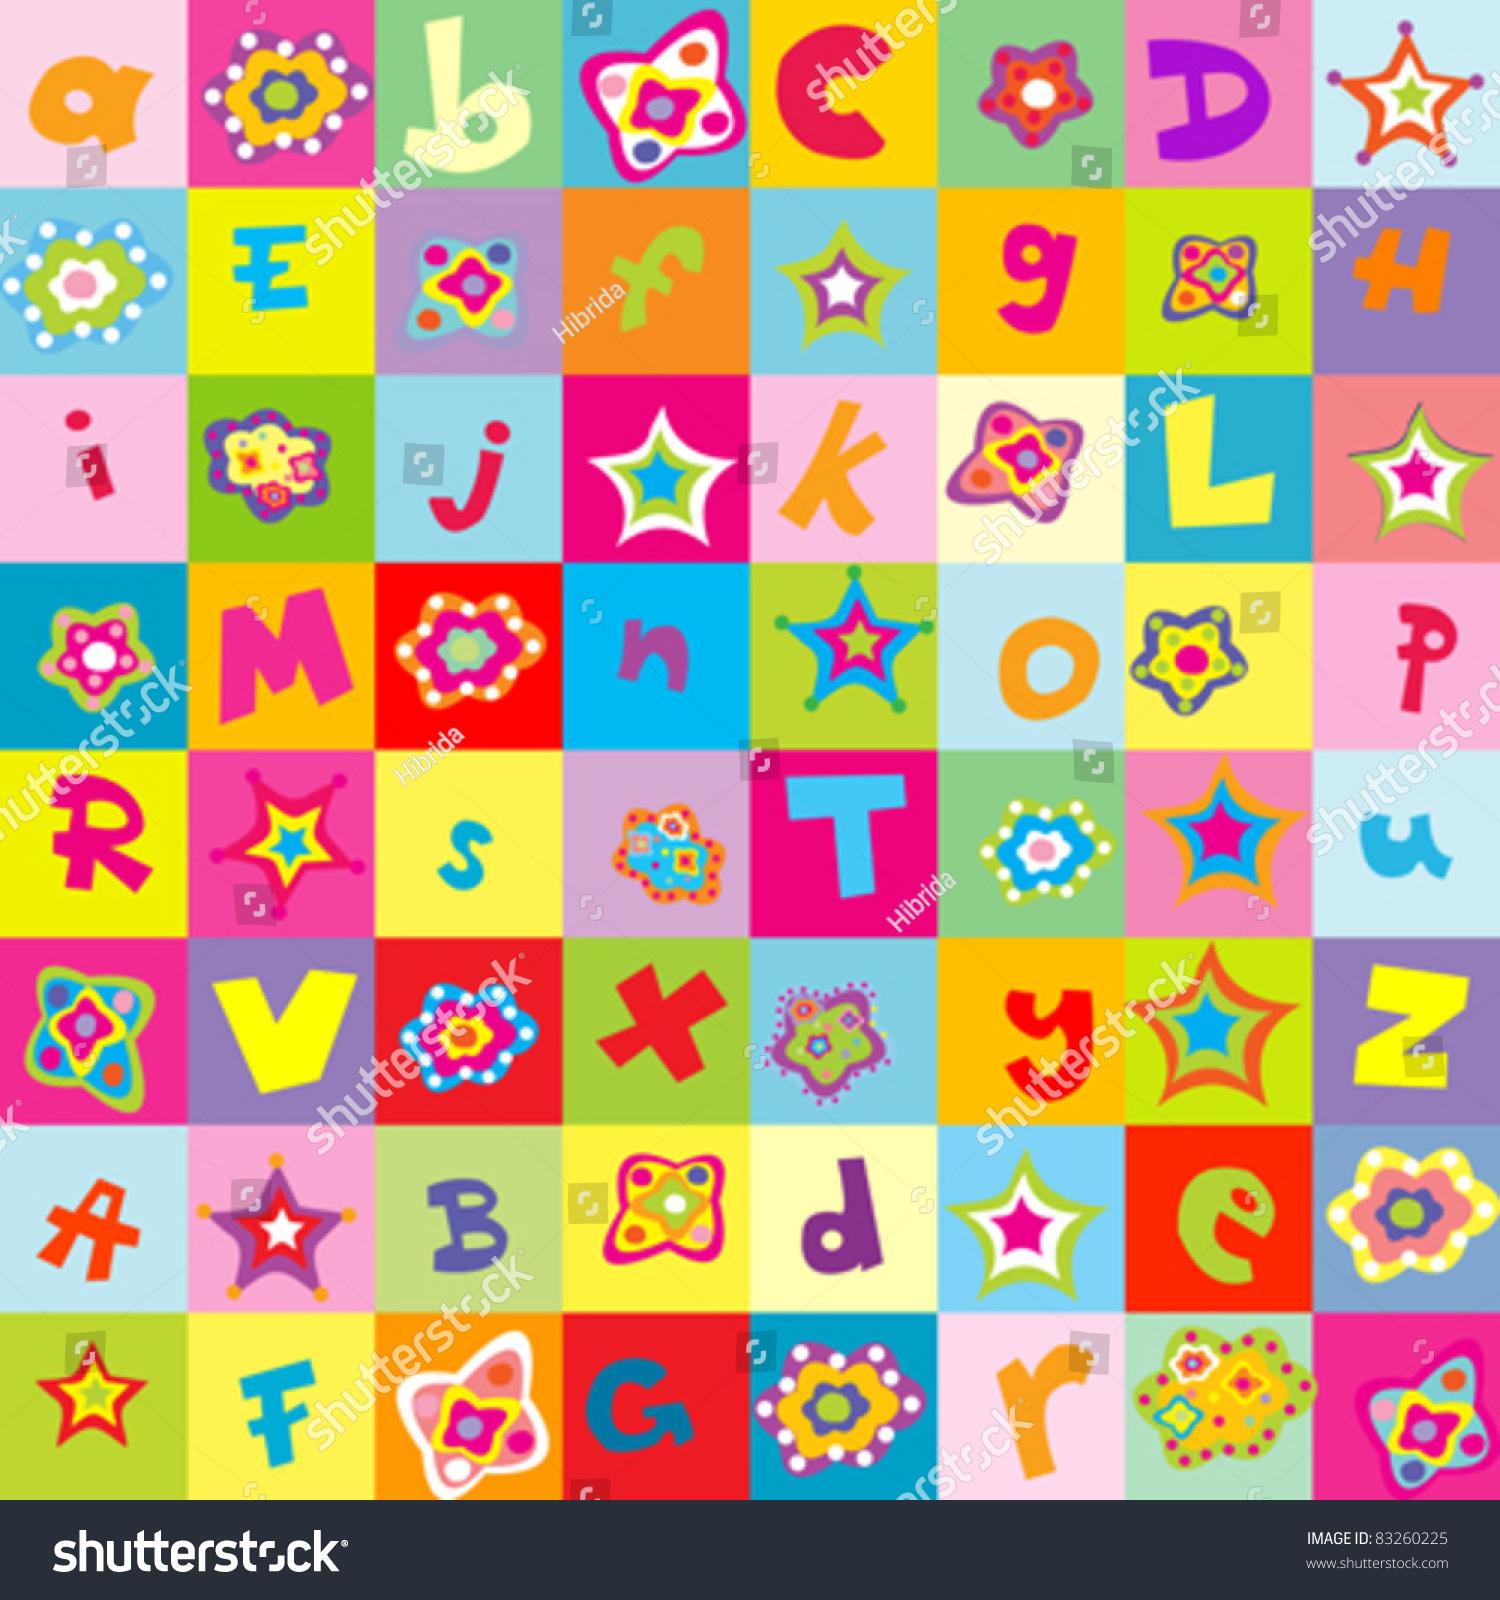 Worksheet Kindergarten Letters background with letters and flowers for kindergarten stock vector illustration 83260225 shutterstock